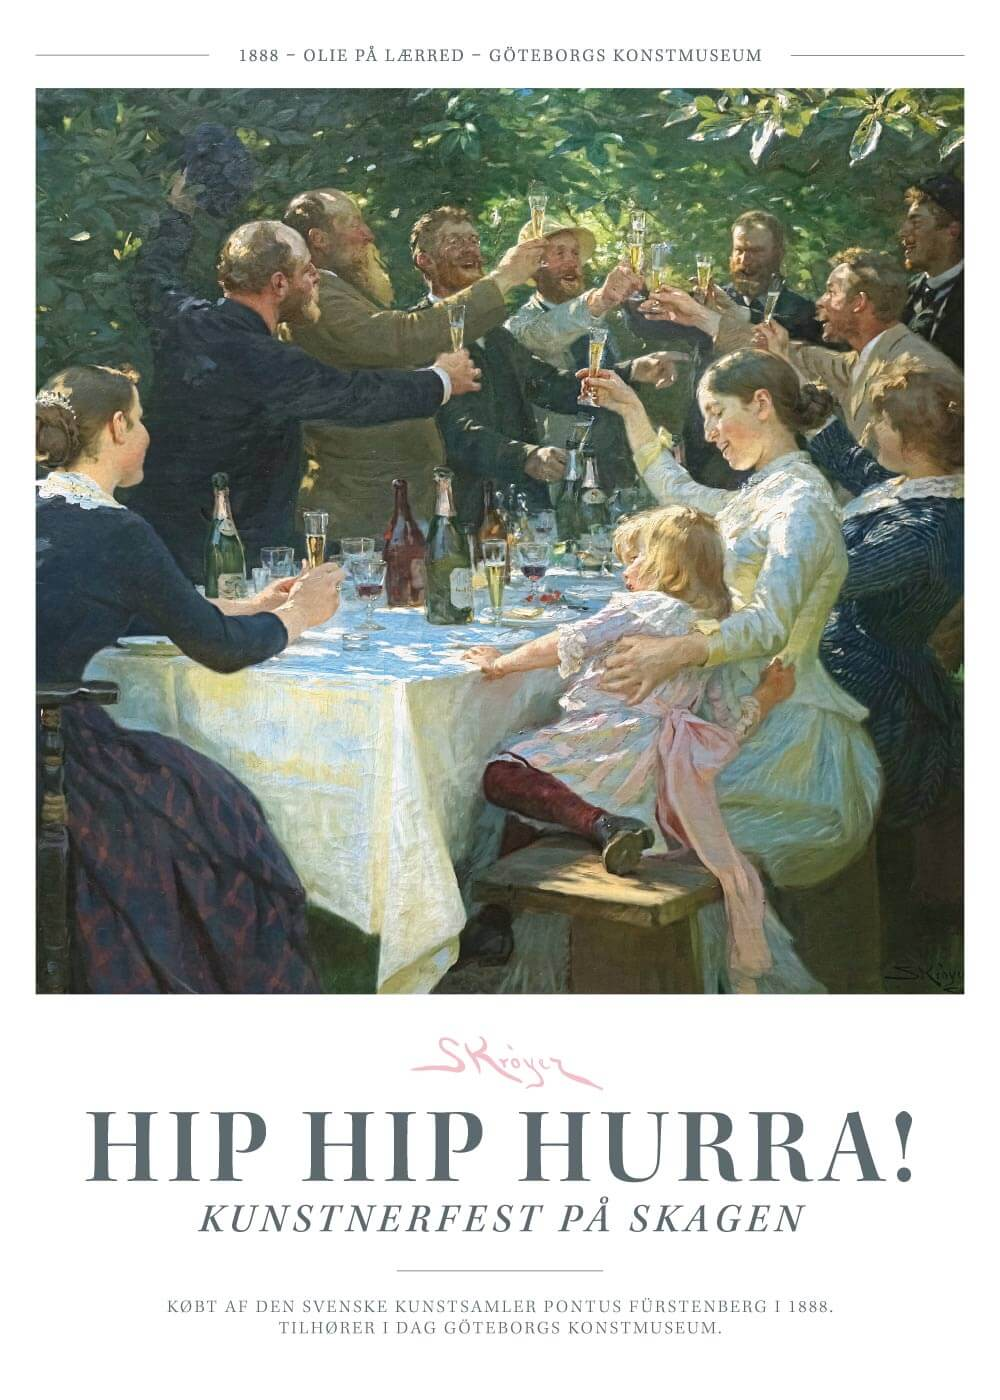 Hip hip hurra! - P.S. Krøyer plakat